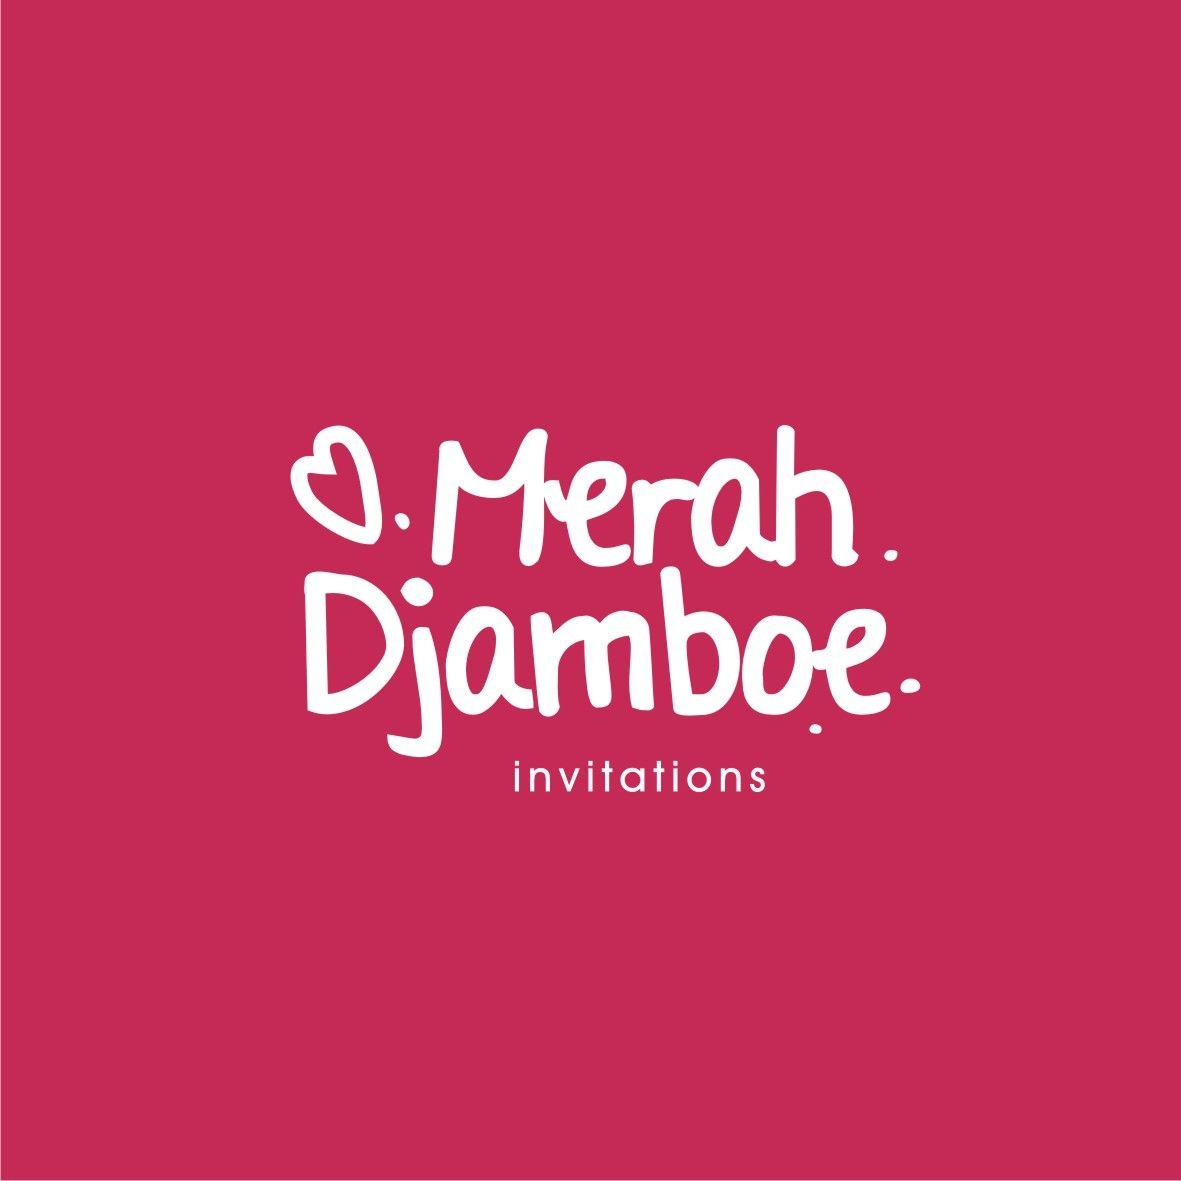 Directory of Wedding Invitations Vendors in Yogyakarta | Bridestory.com